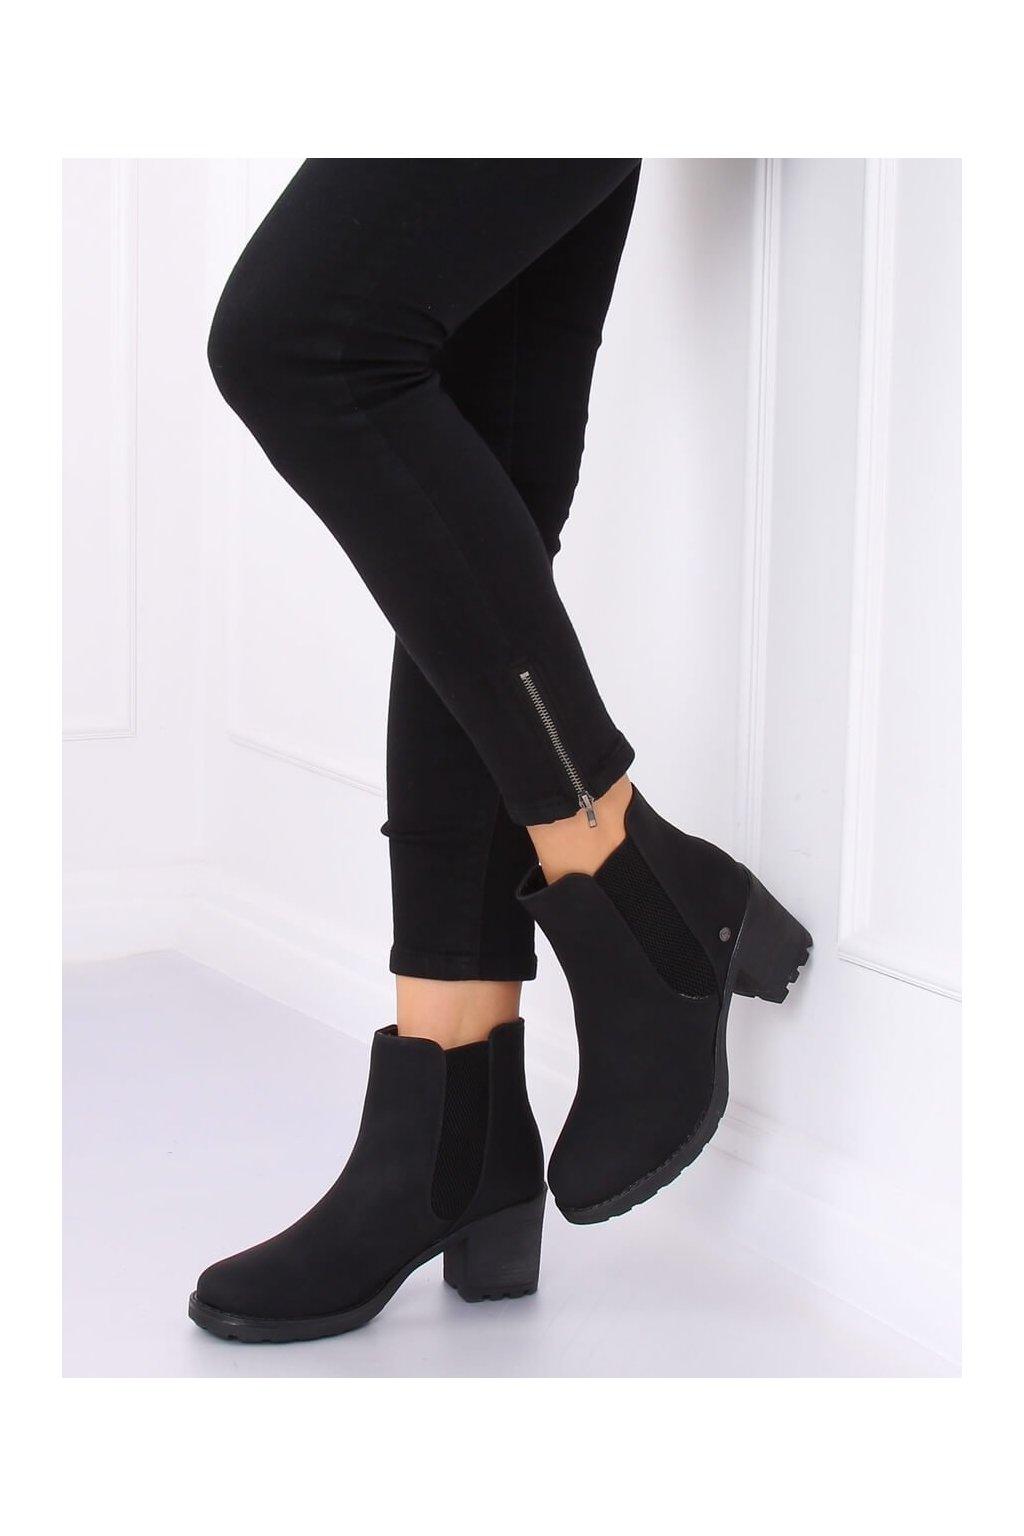 Dámske členkové topánky čierne na širokom podpätku L2065